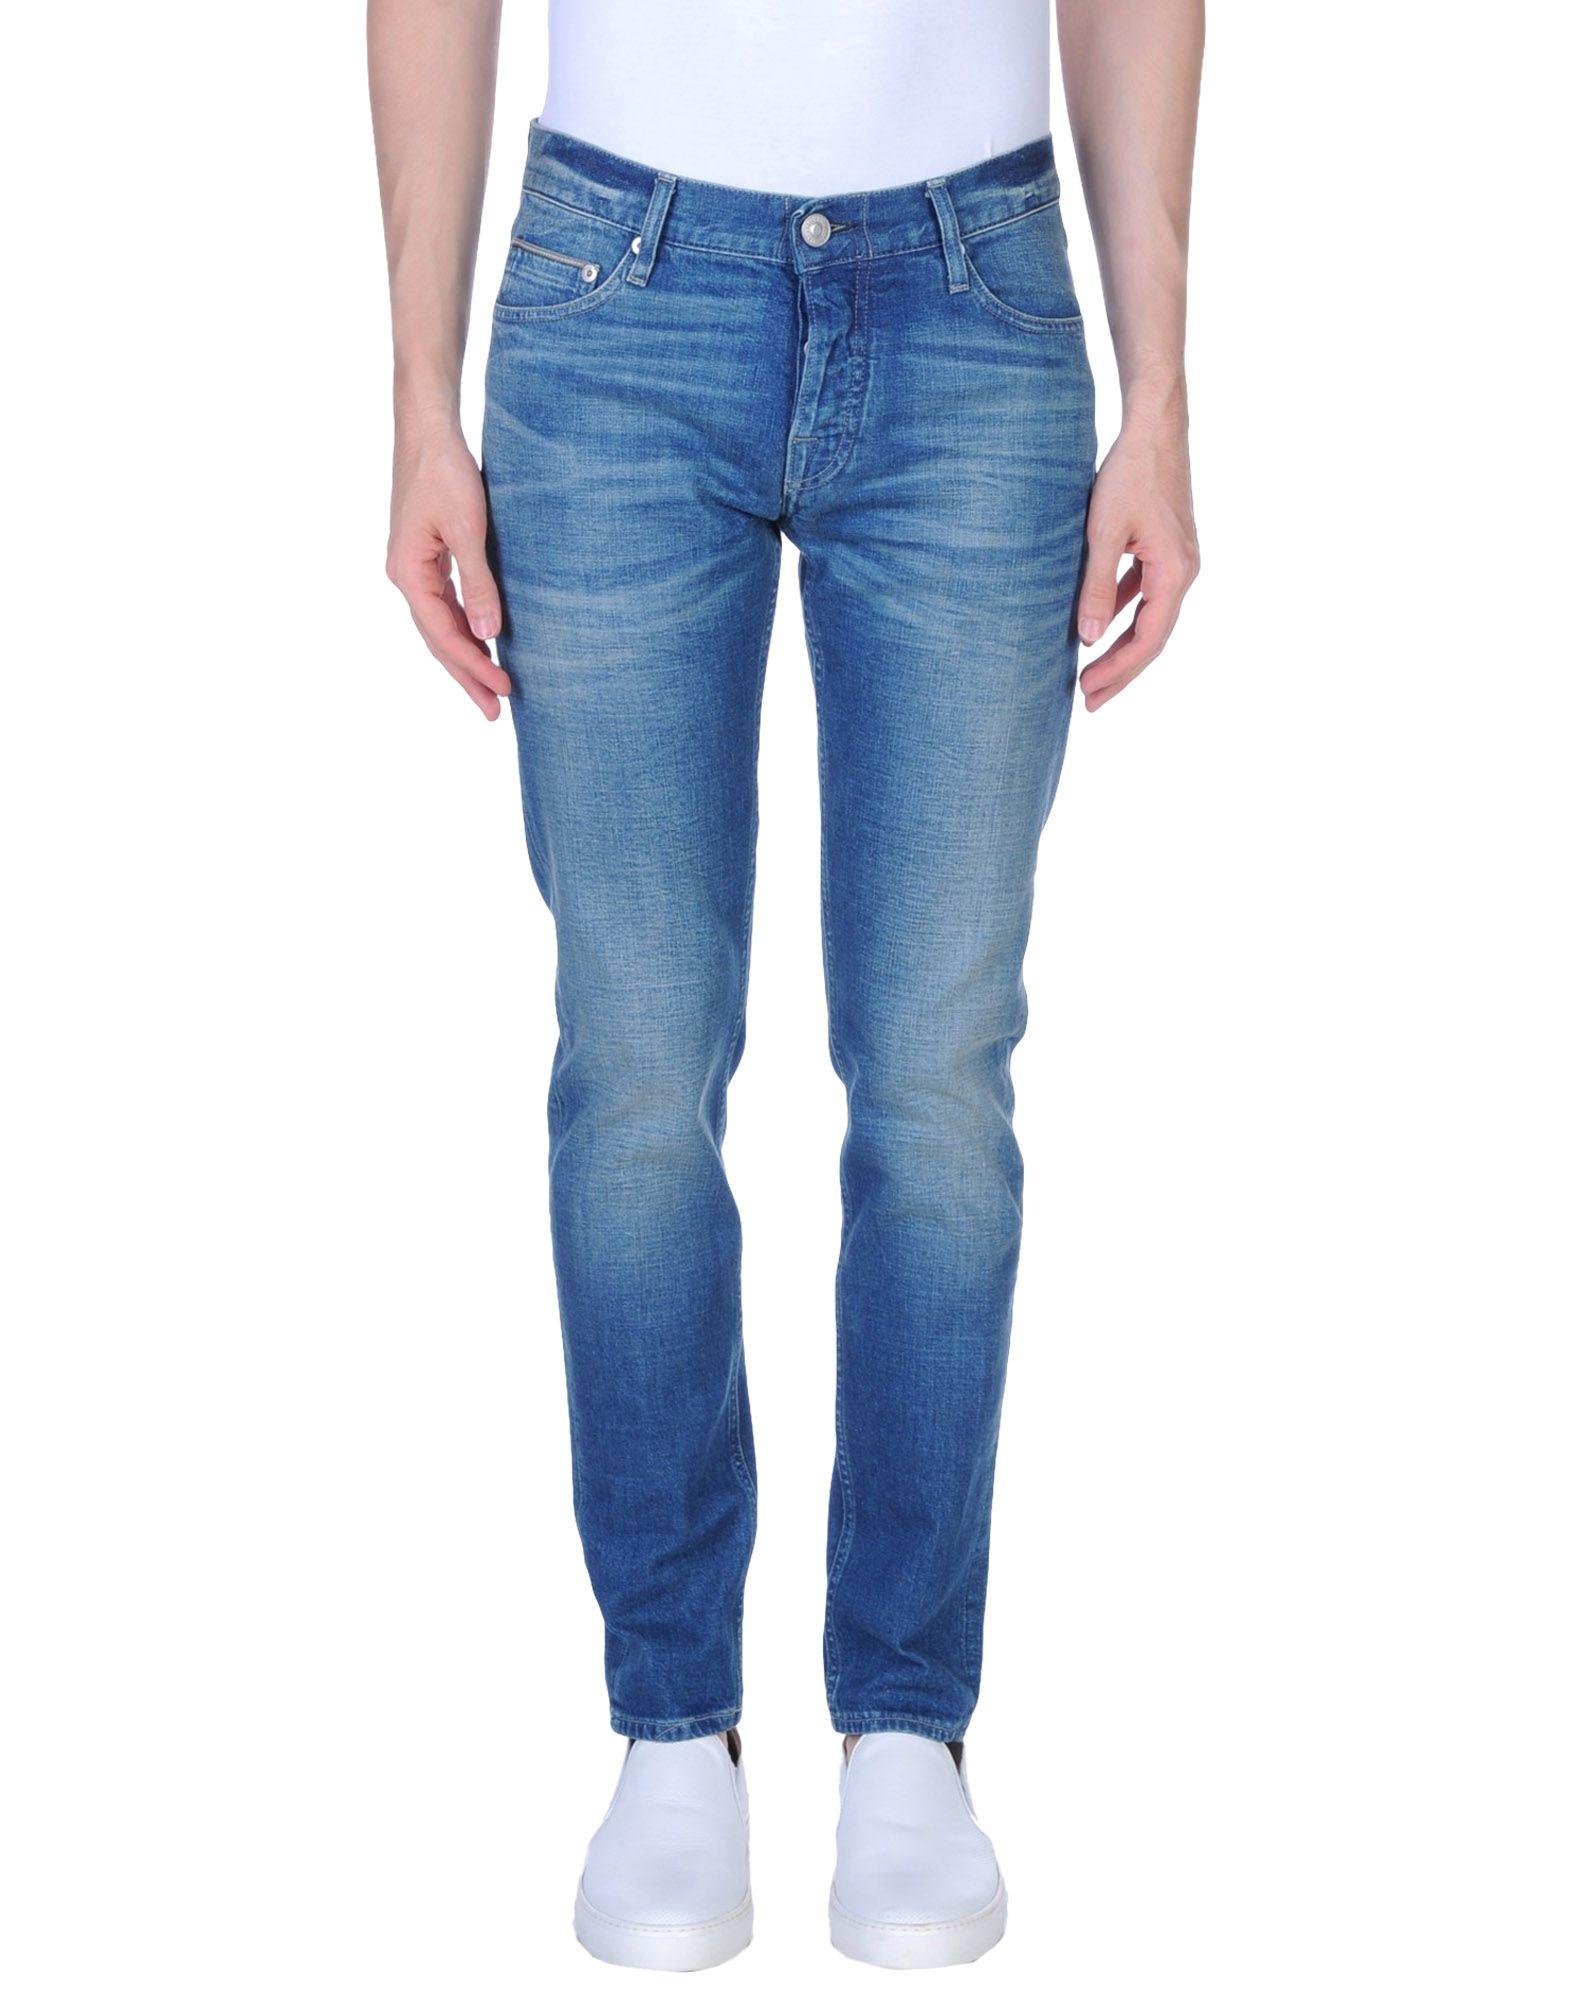 Pantaloni Jeans Care Label Uomo - Acquista online su